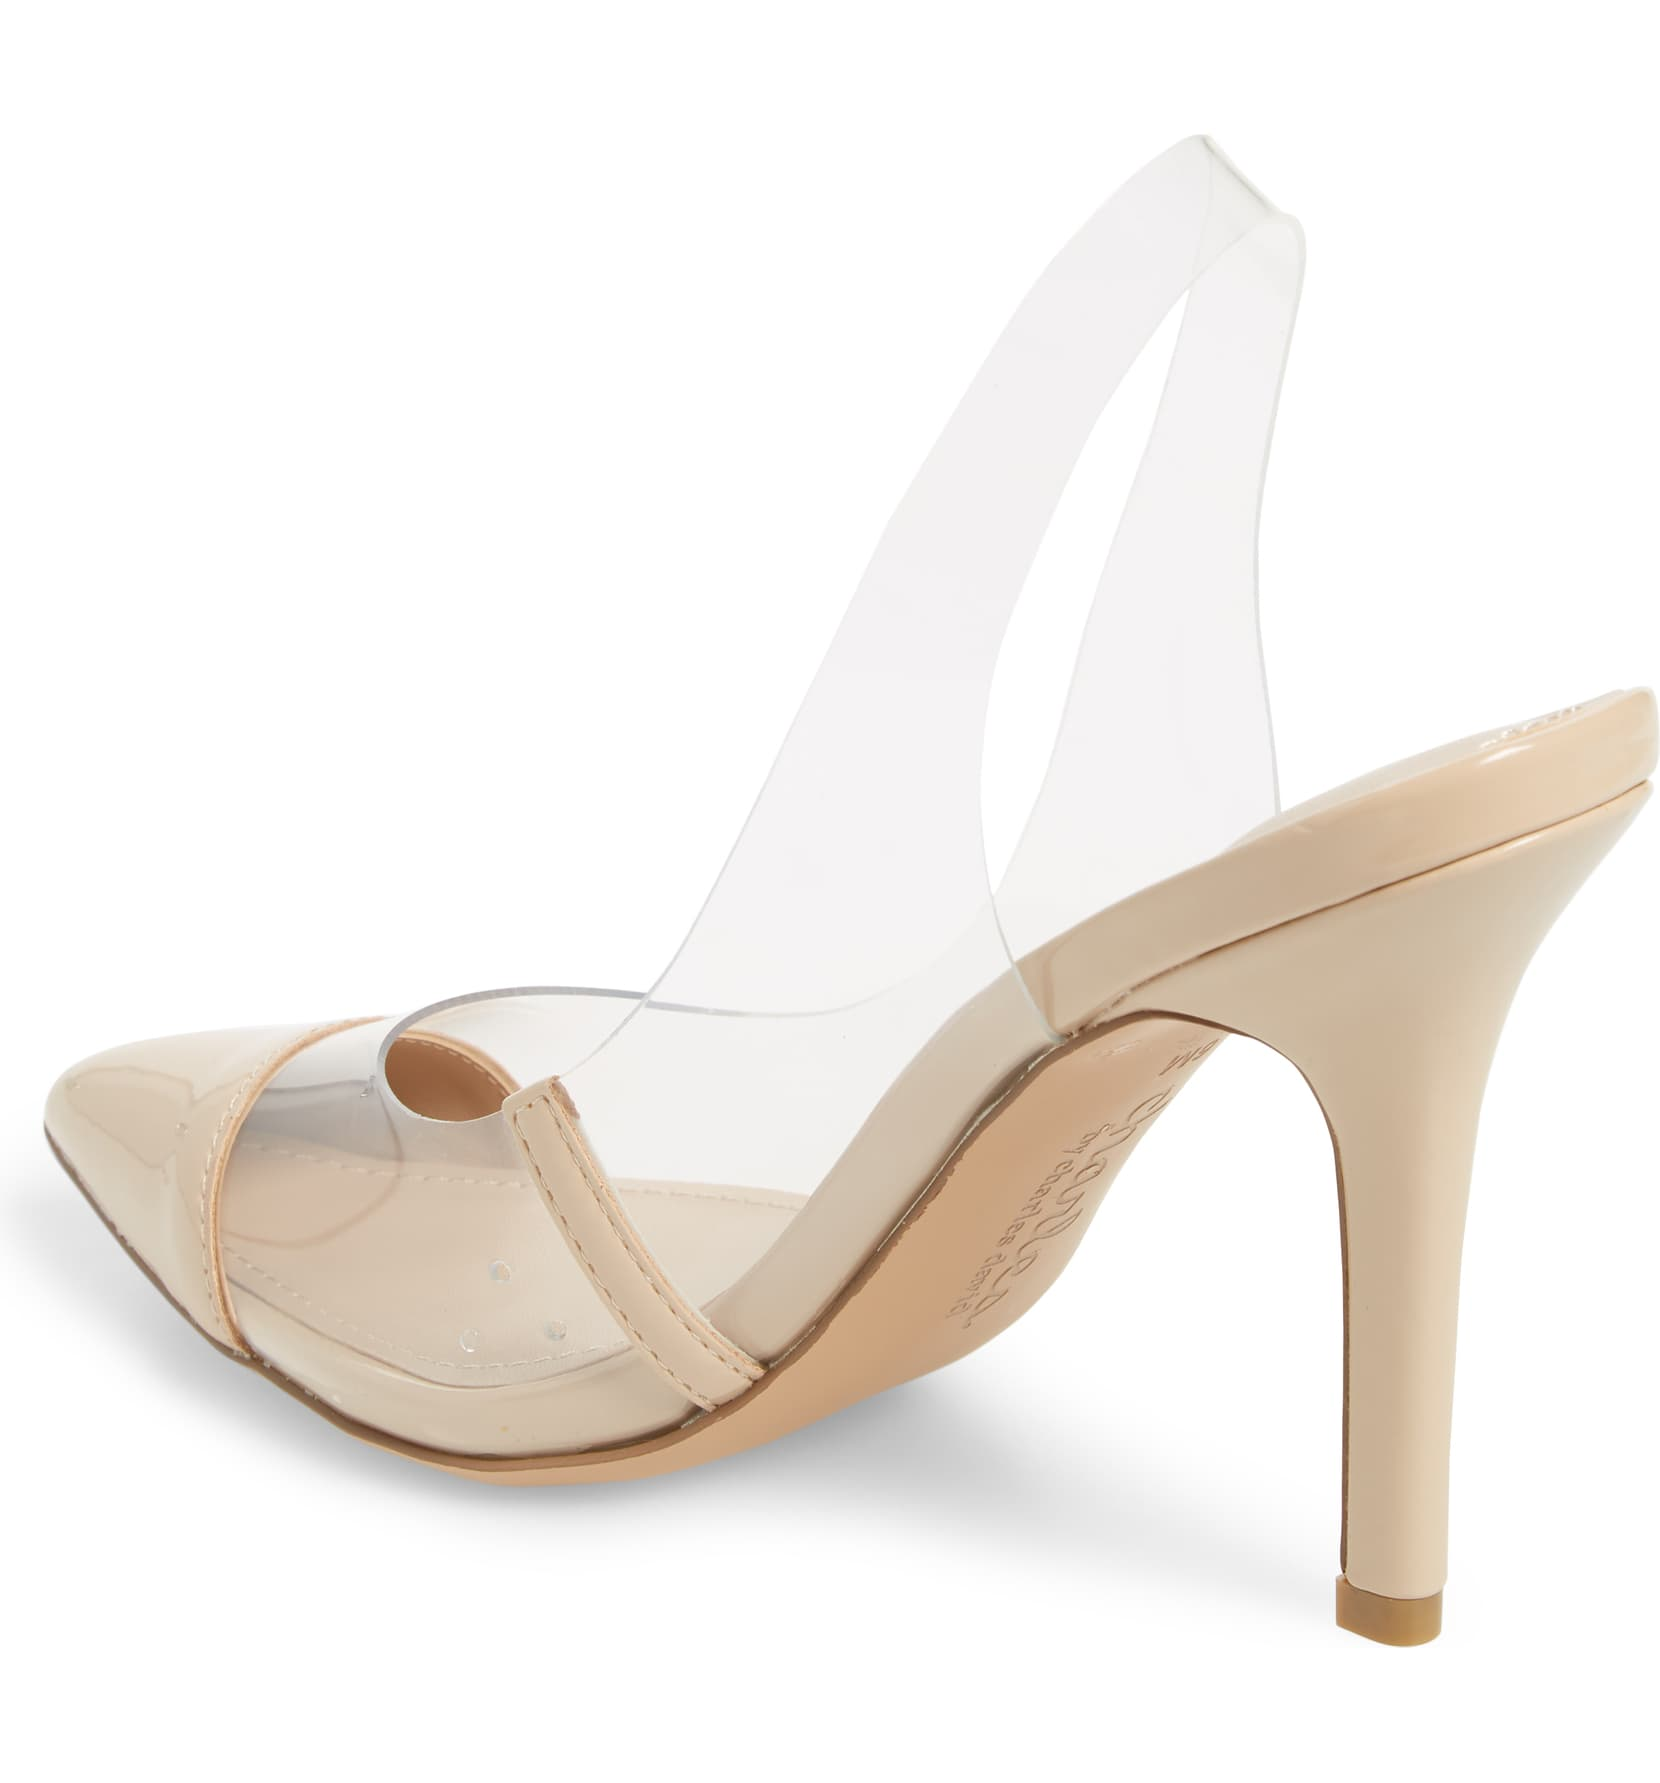 Nude Clear Sculptural Heel Slingback Pumps - CHARLES